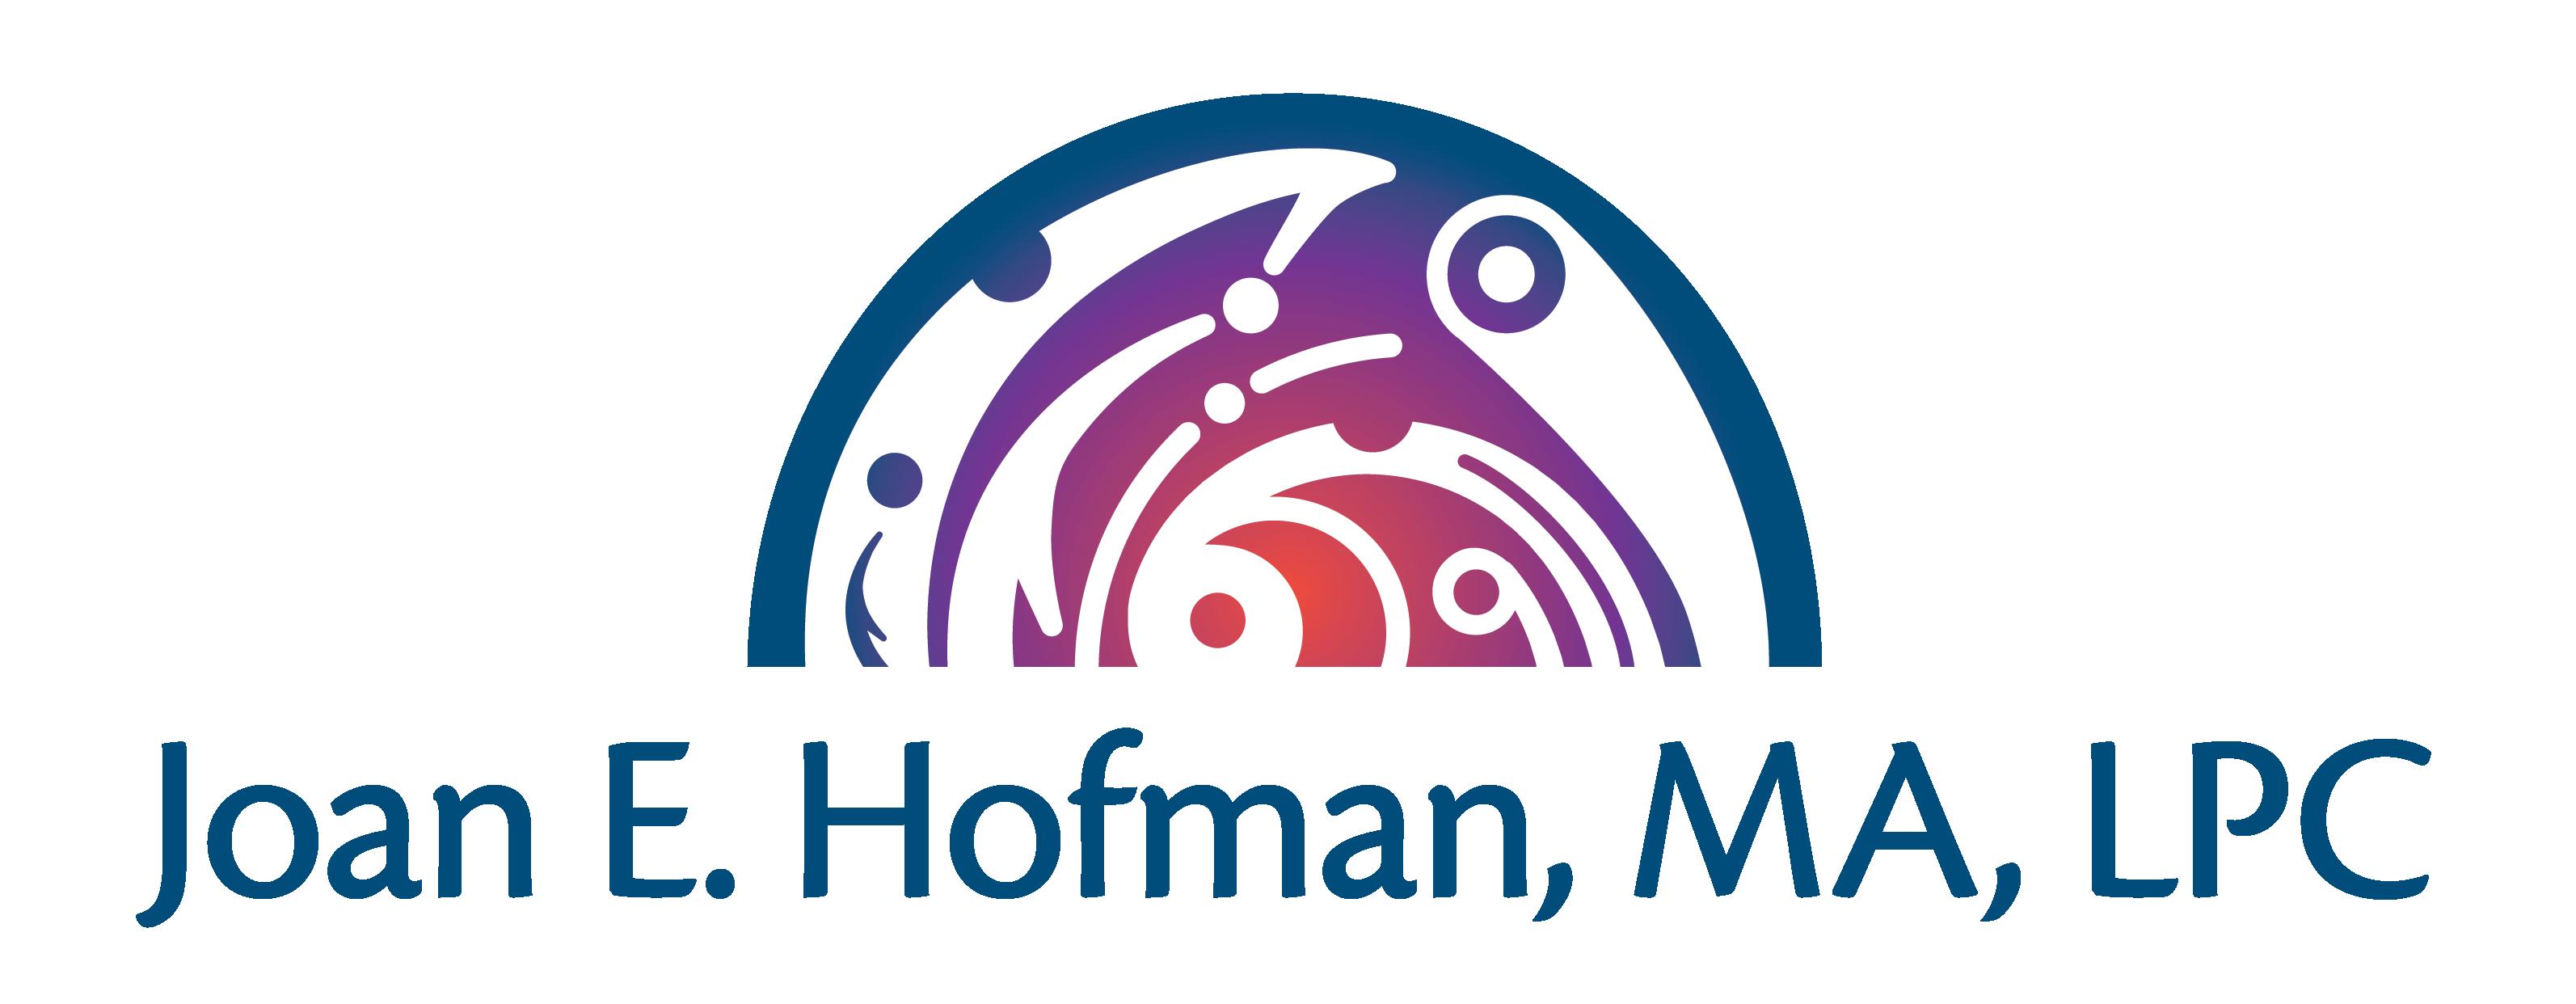 Joan Hofman, MA, LPC